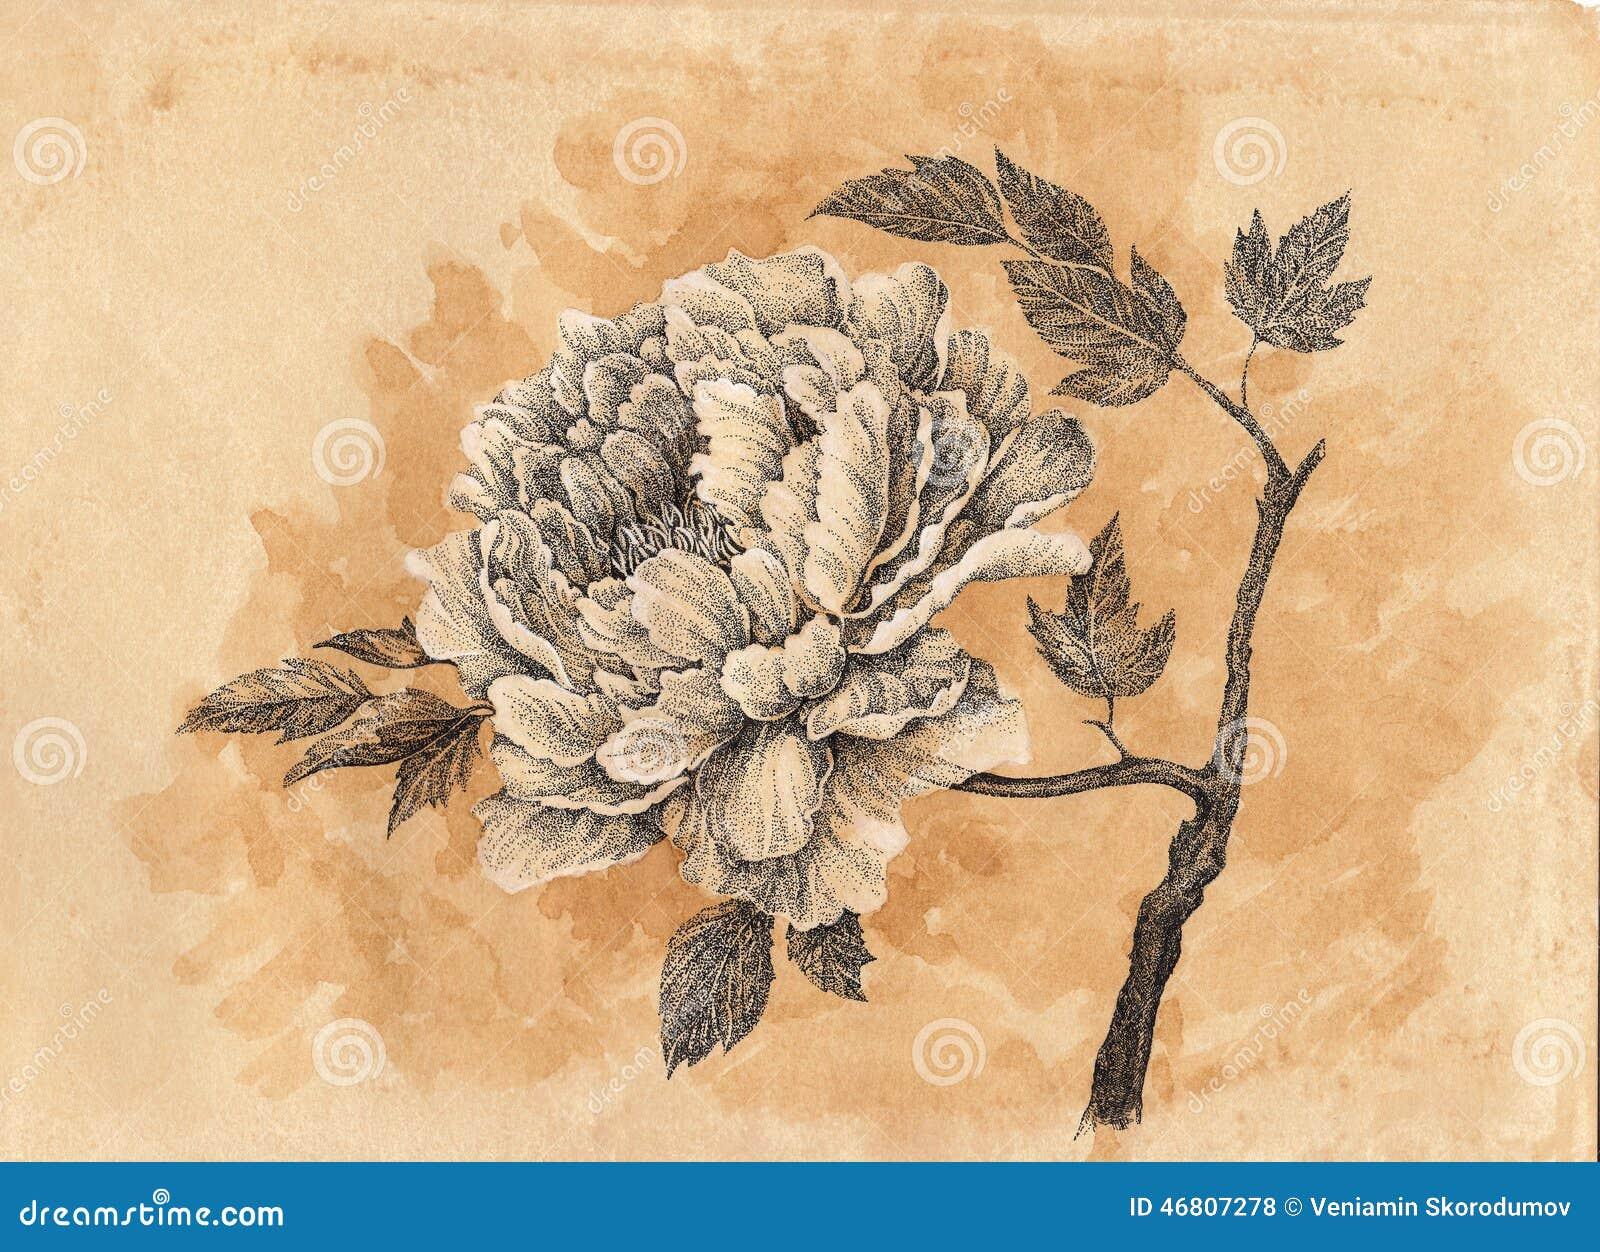 dessin la main cardez fleur de pivoine illustration stock illustration du fond fleur. Black Bedroom Furniture Sets. Home Design Ideas